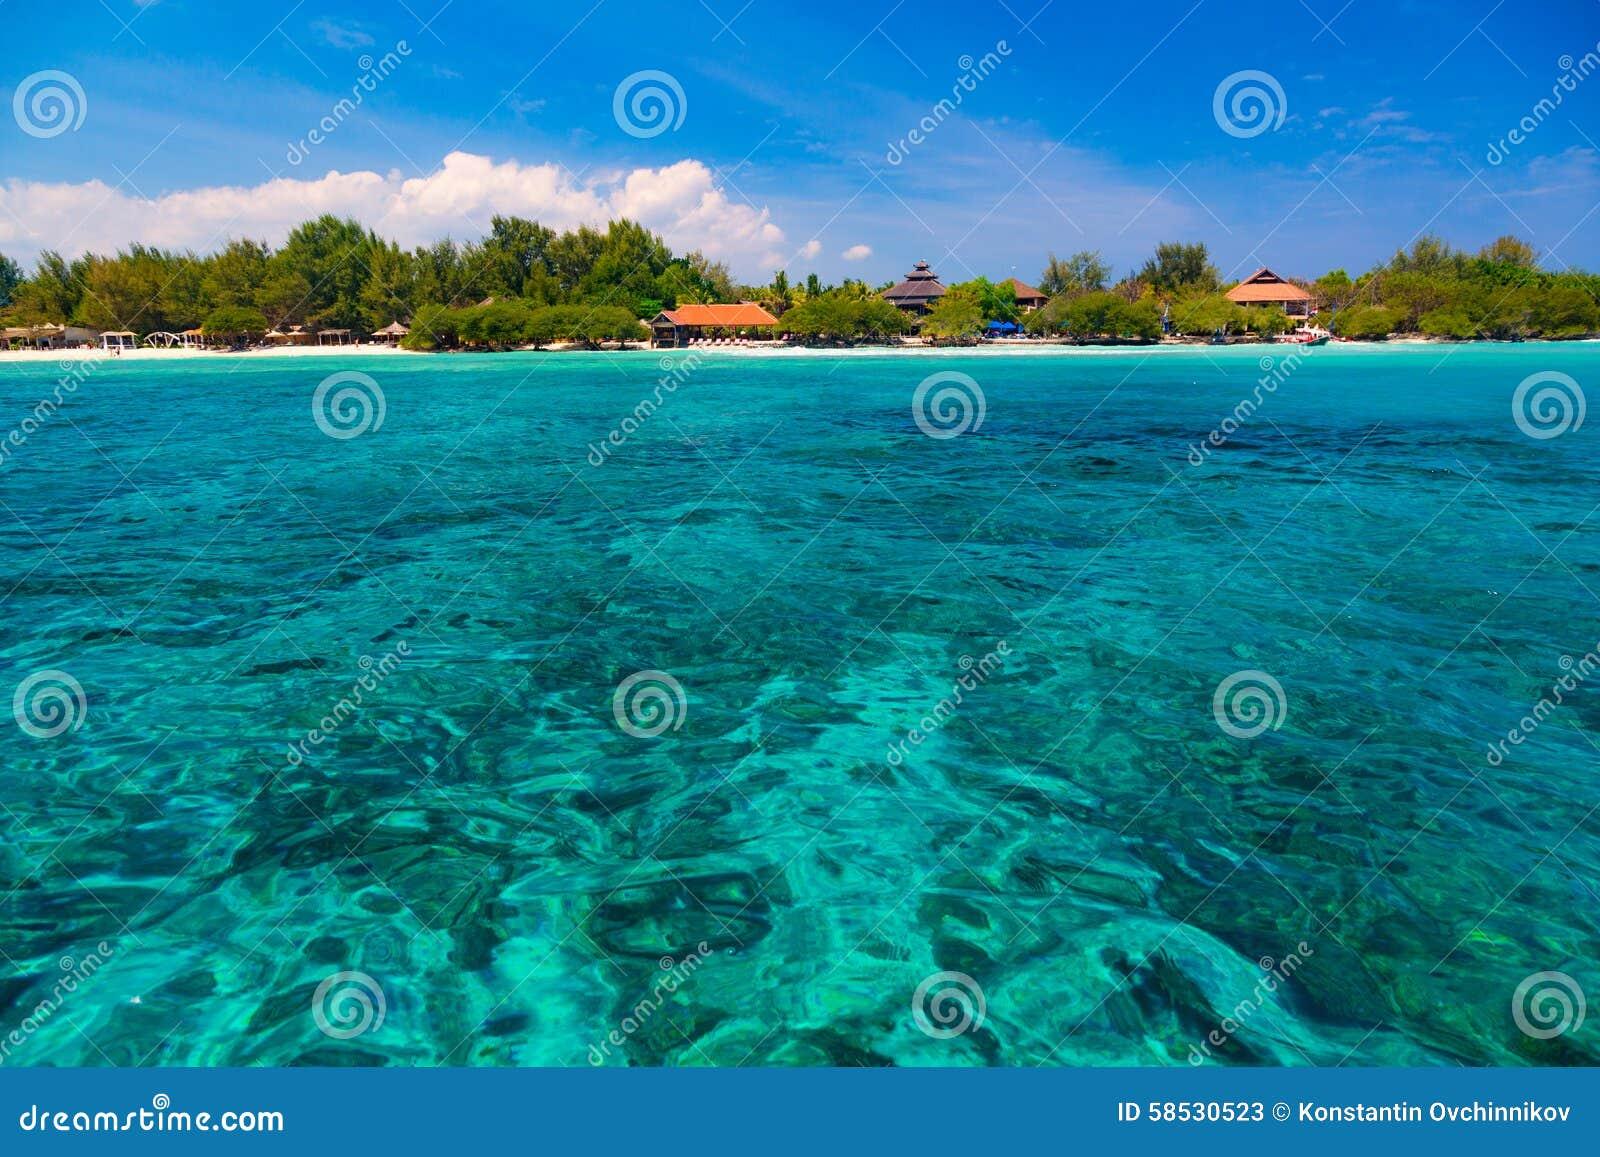 Tropische Lagune Stockbild Bild Von Farbe Lagune Feiertag 58530523